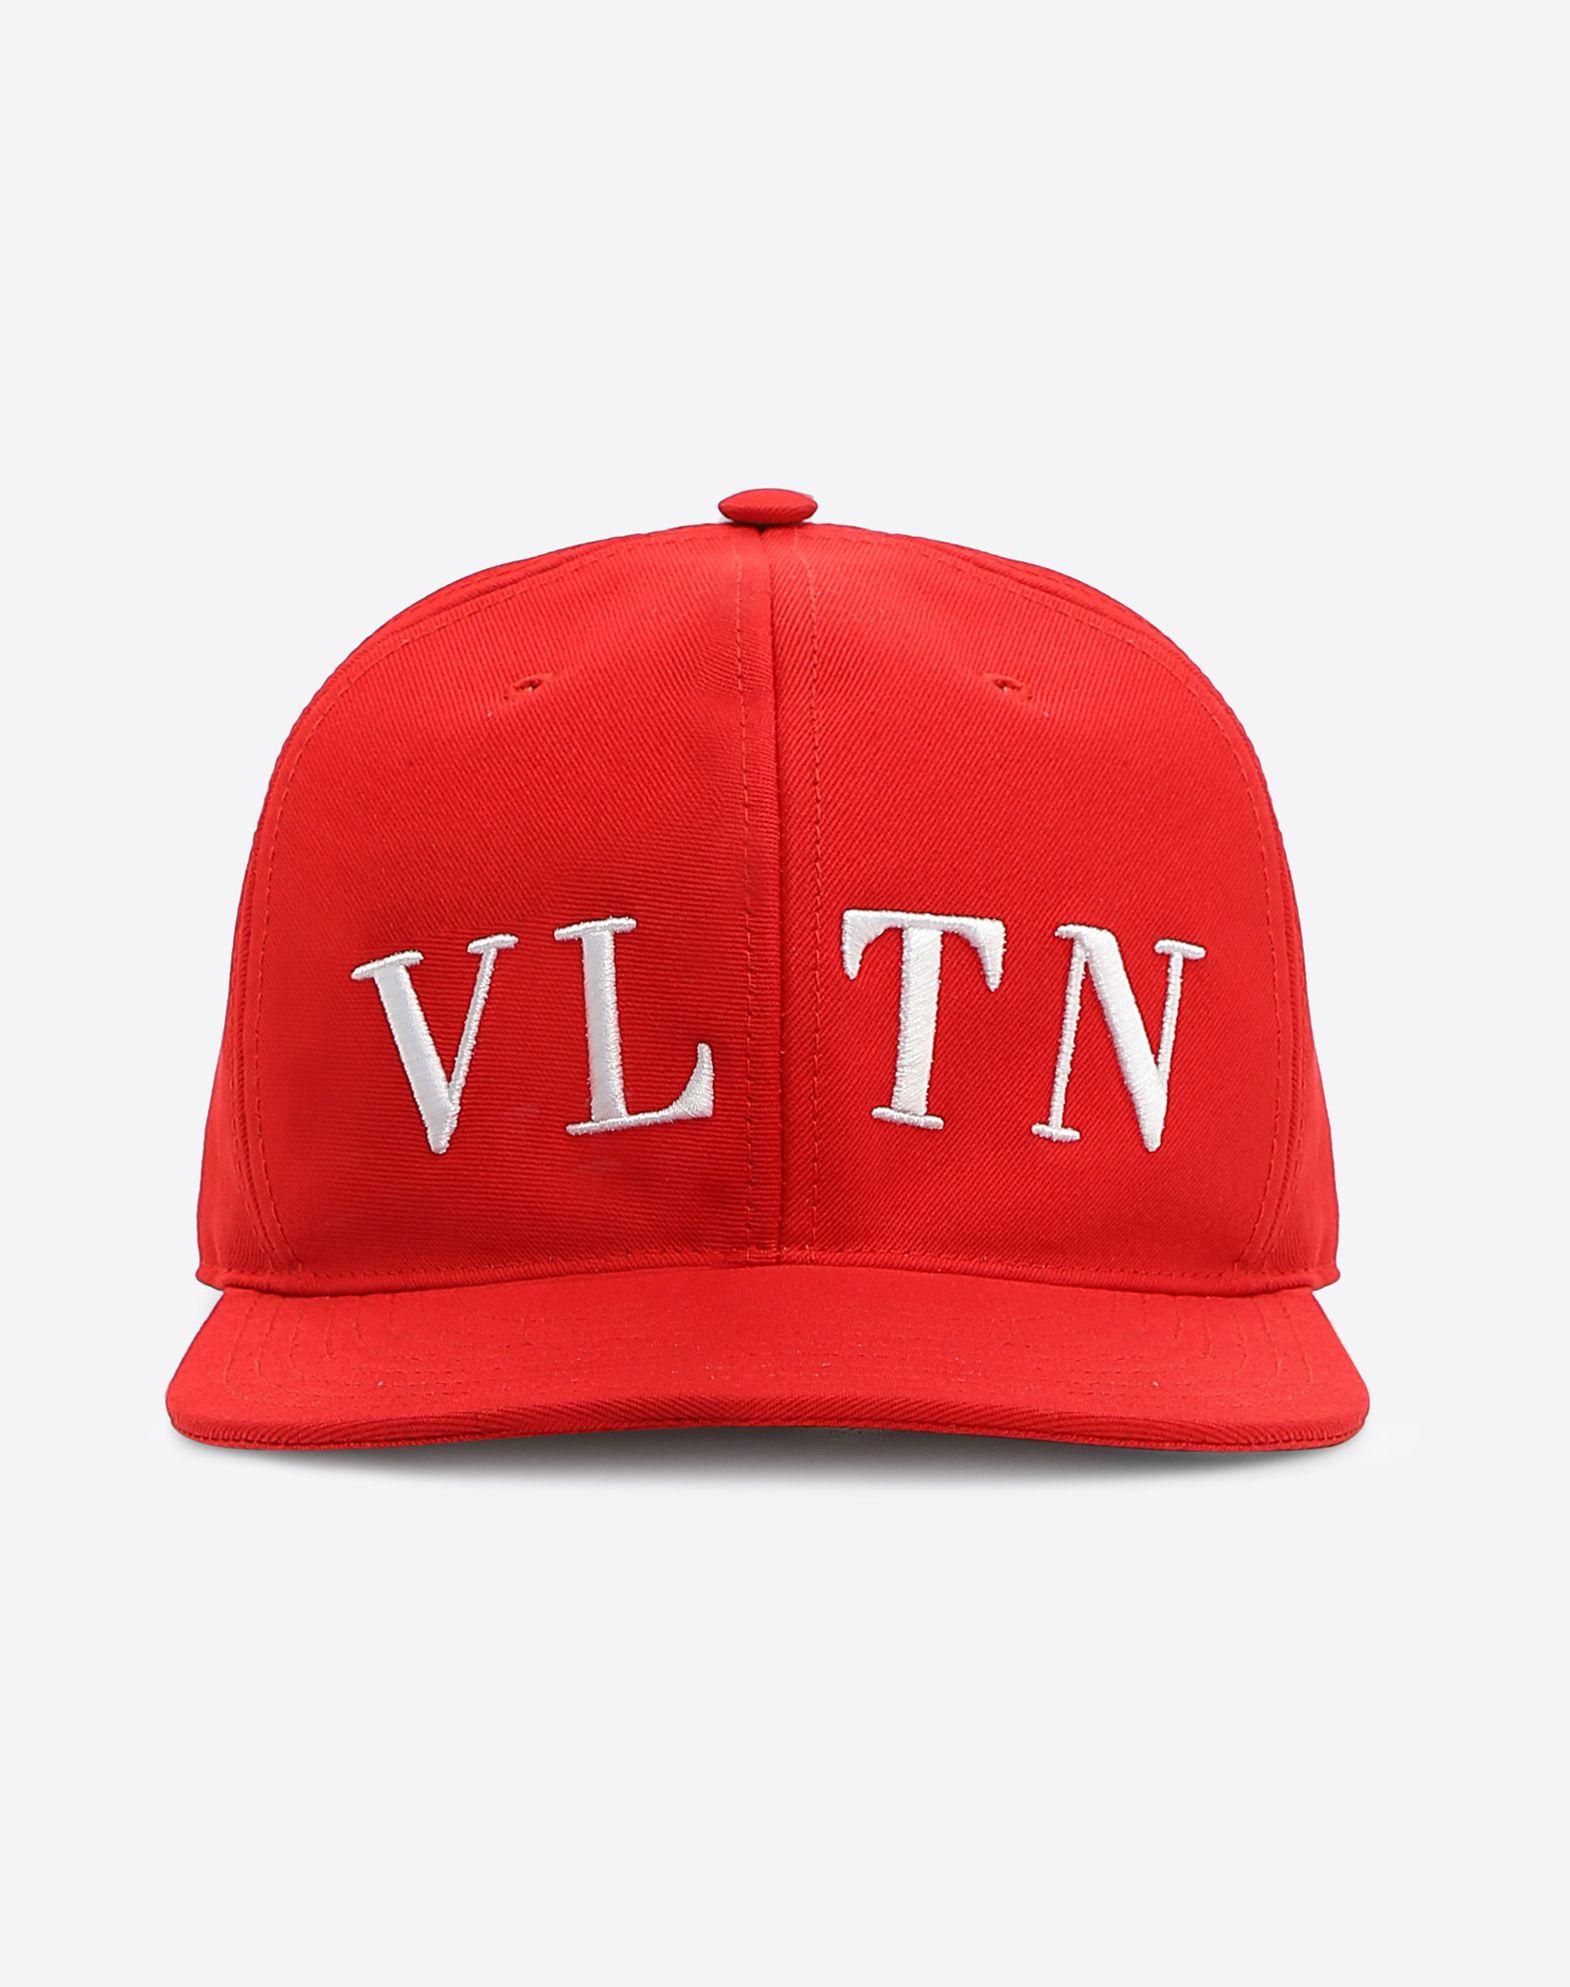 VALENTINO Gabardine Embroidered detailing Hard visor  46563927gx